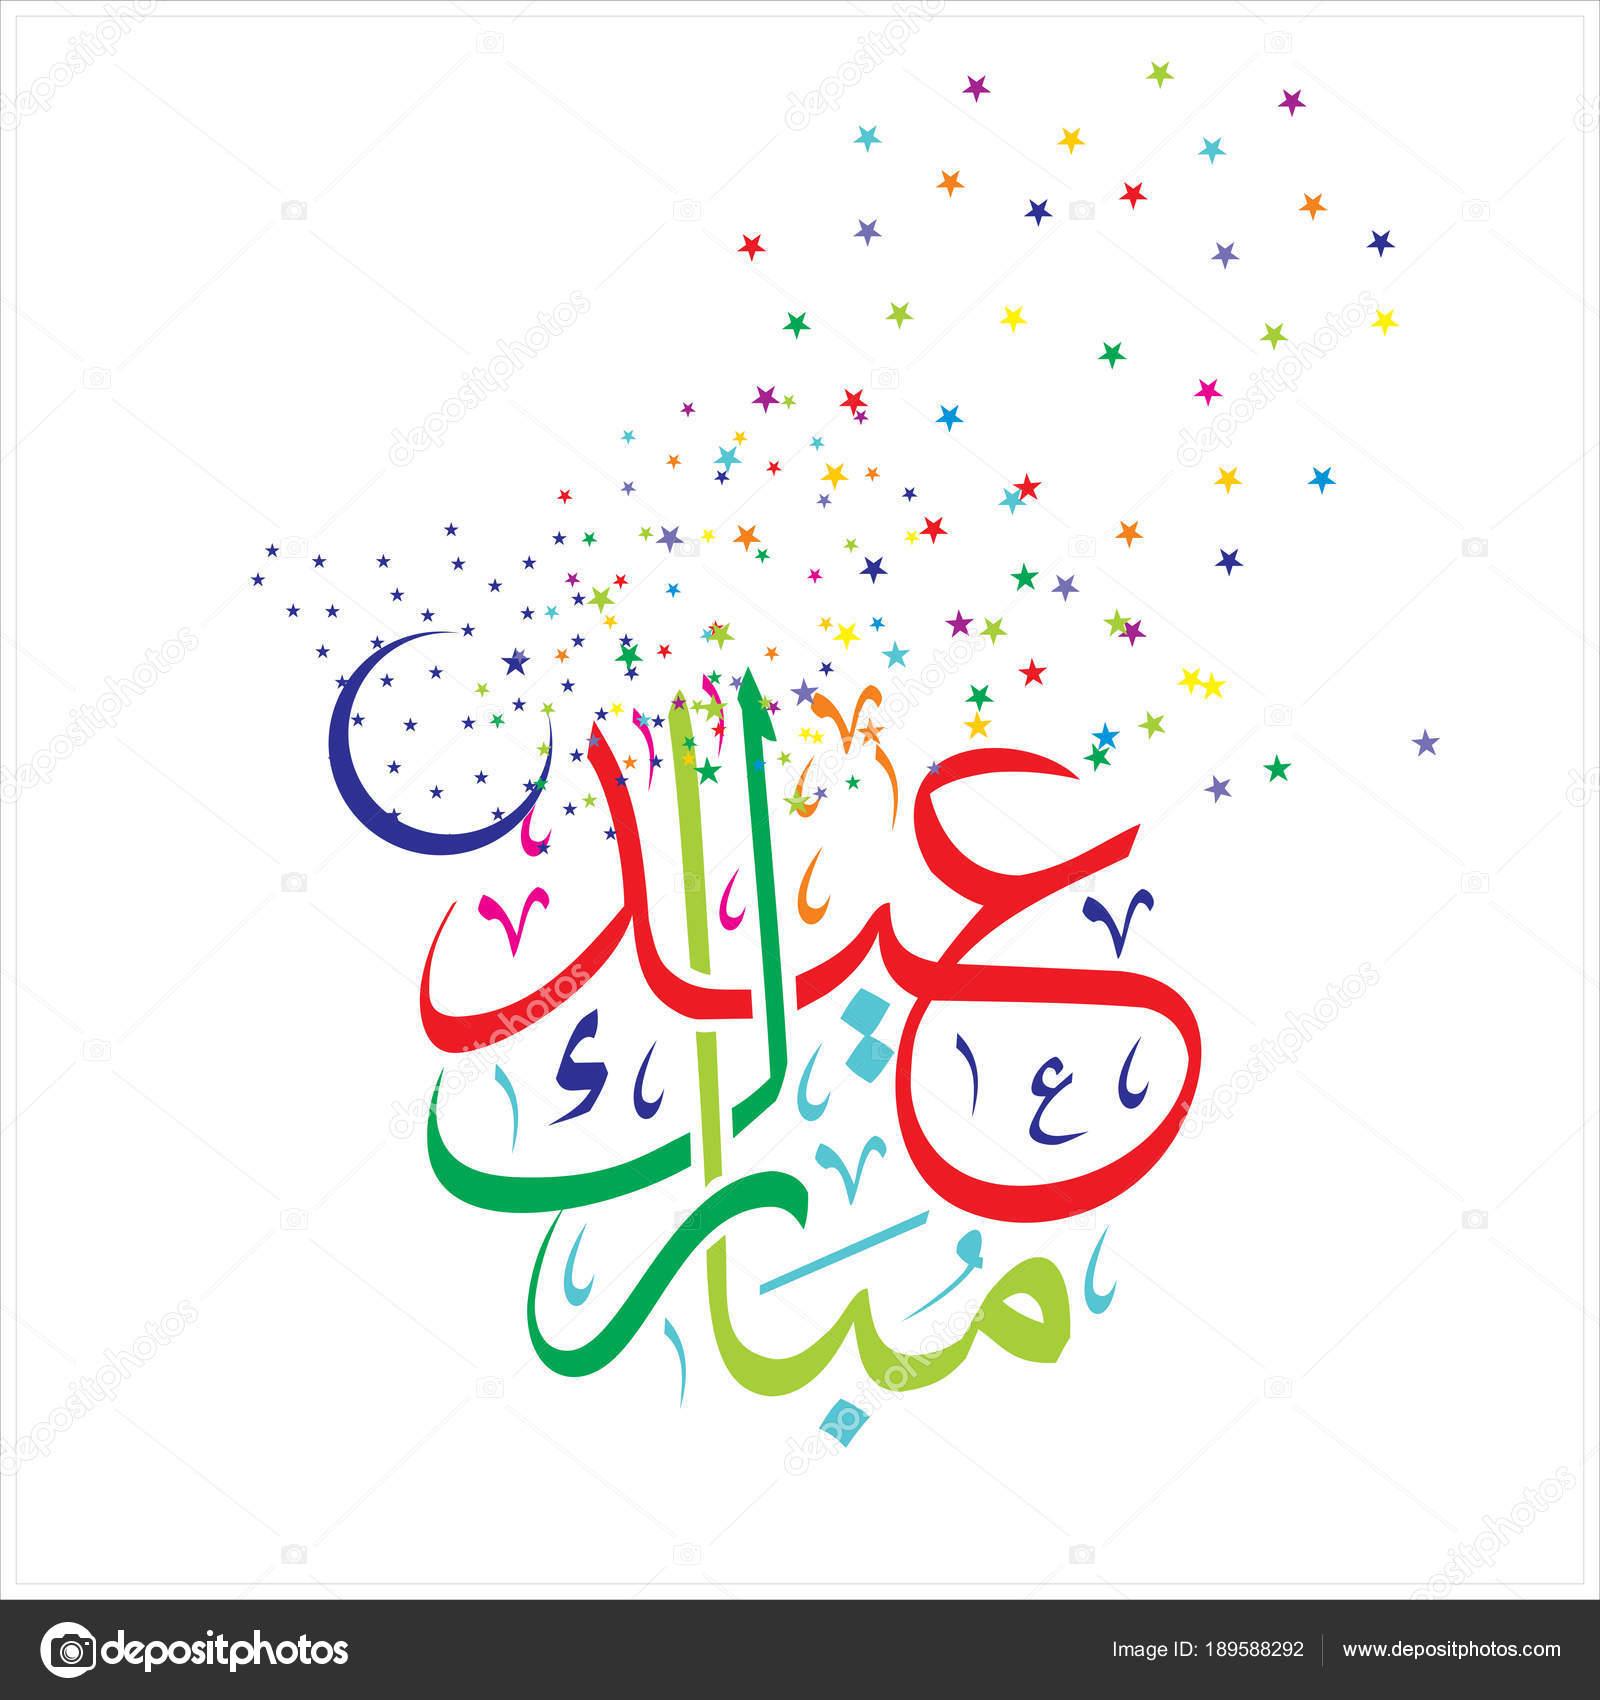 Happy Eid Mubarak Arabic Calligraphy Greeting Card Muslim Celebrating Festival Stock Photo Image By C Tajdarshah 189588292